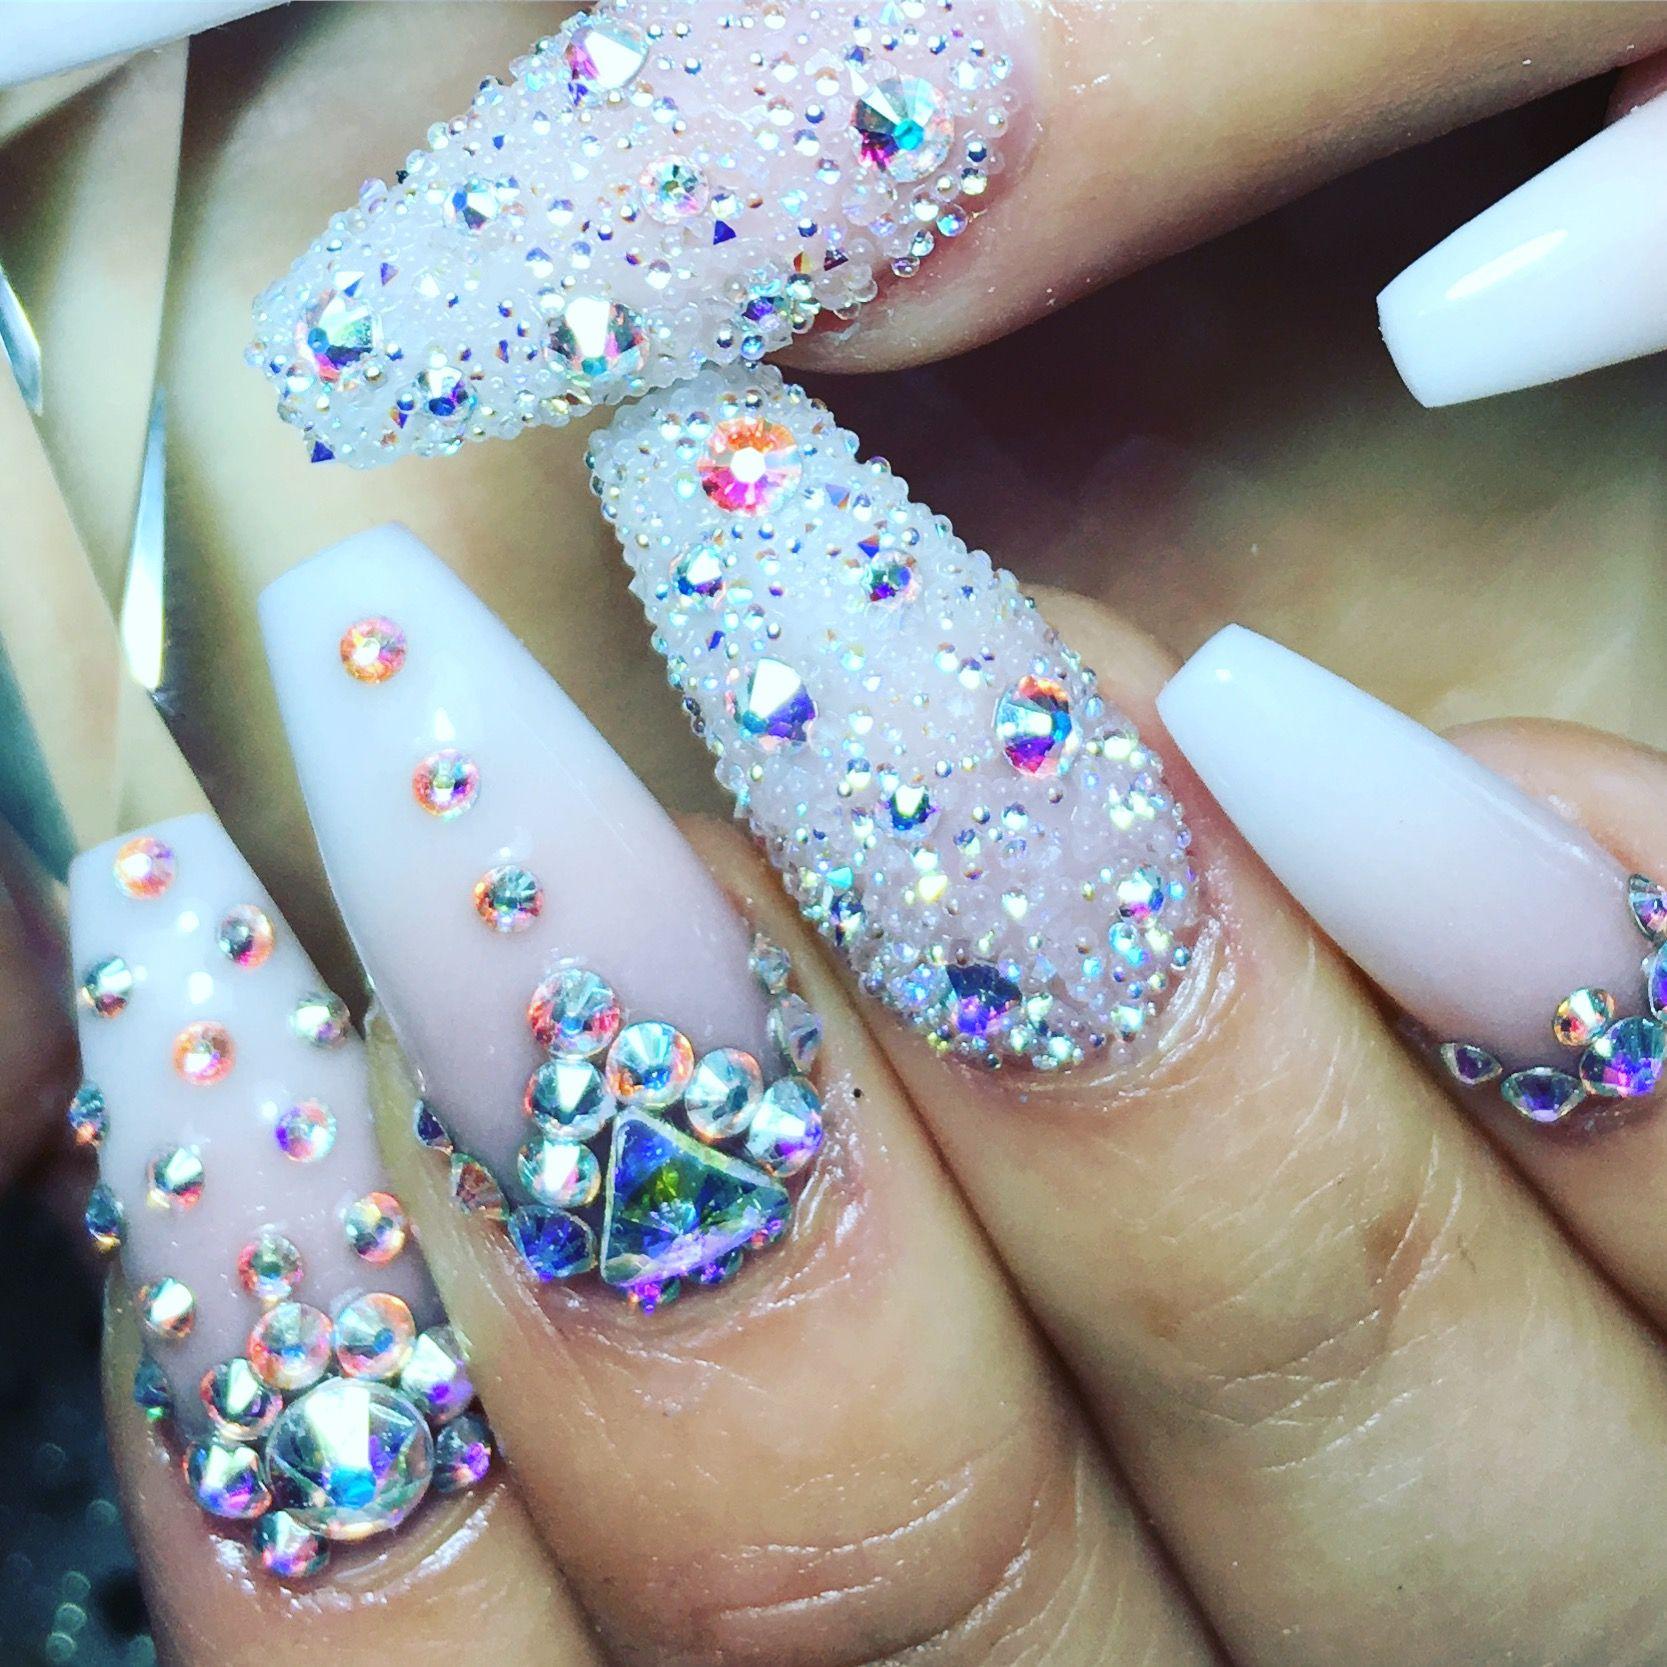 Baby boomer nails @karlasnails Instagram San Bernardino Ca ...